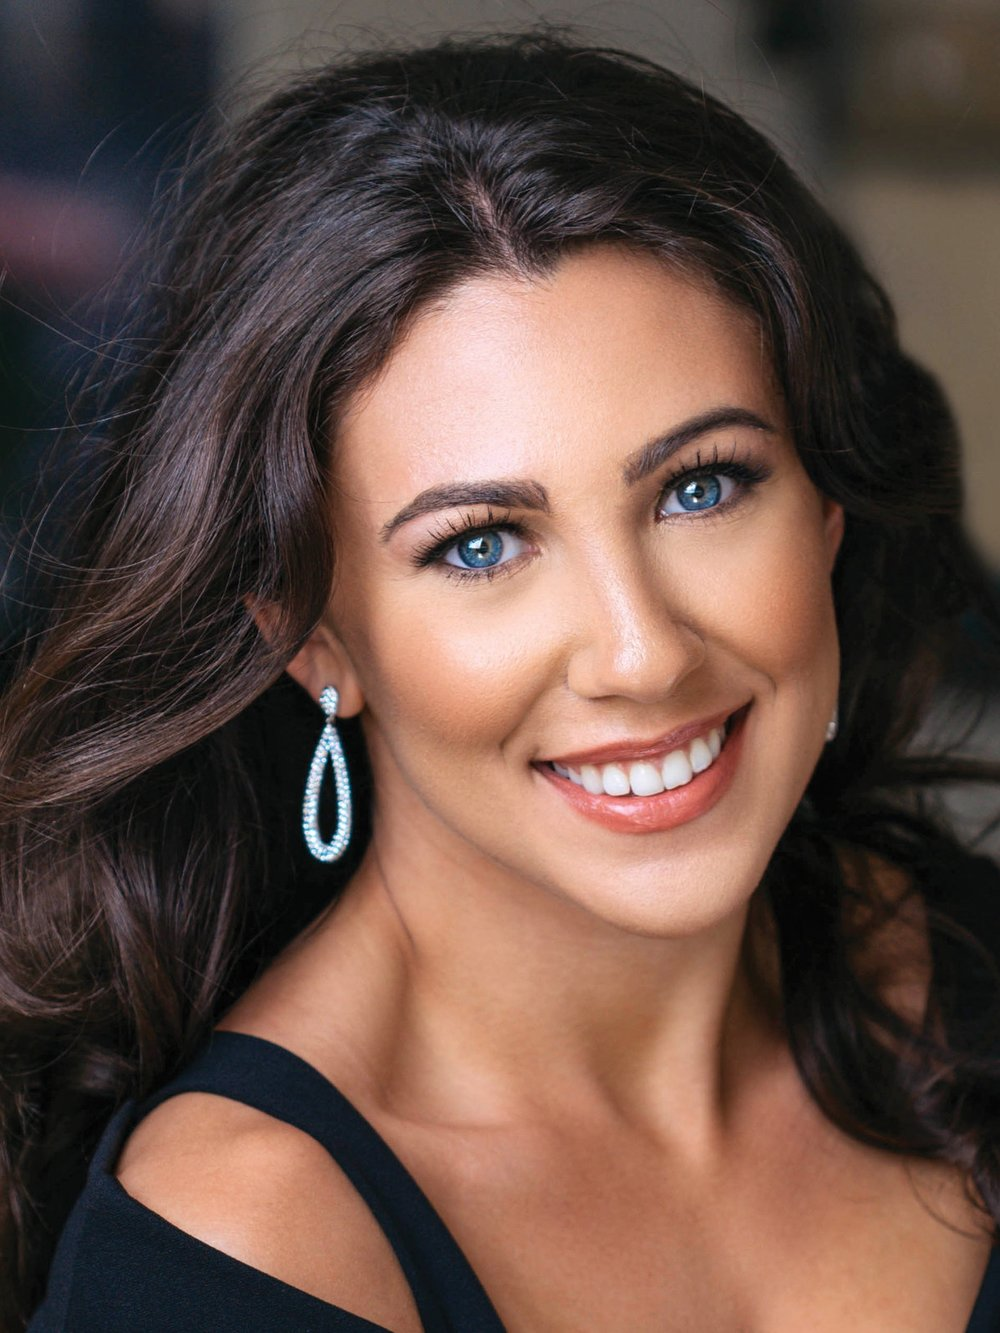 Samantha Trocchia